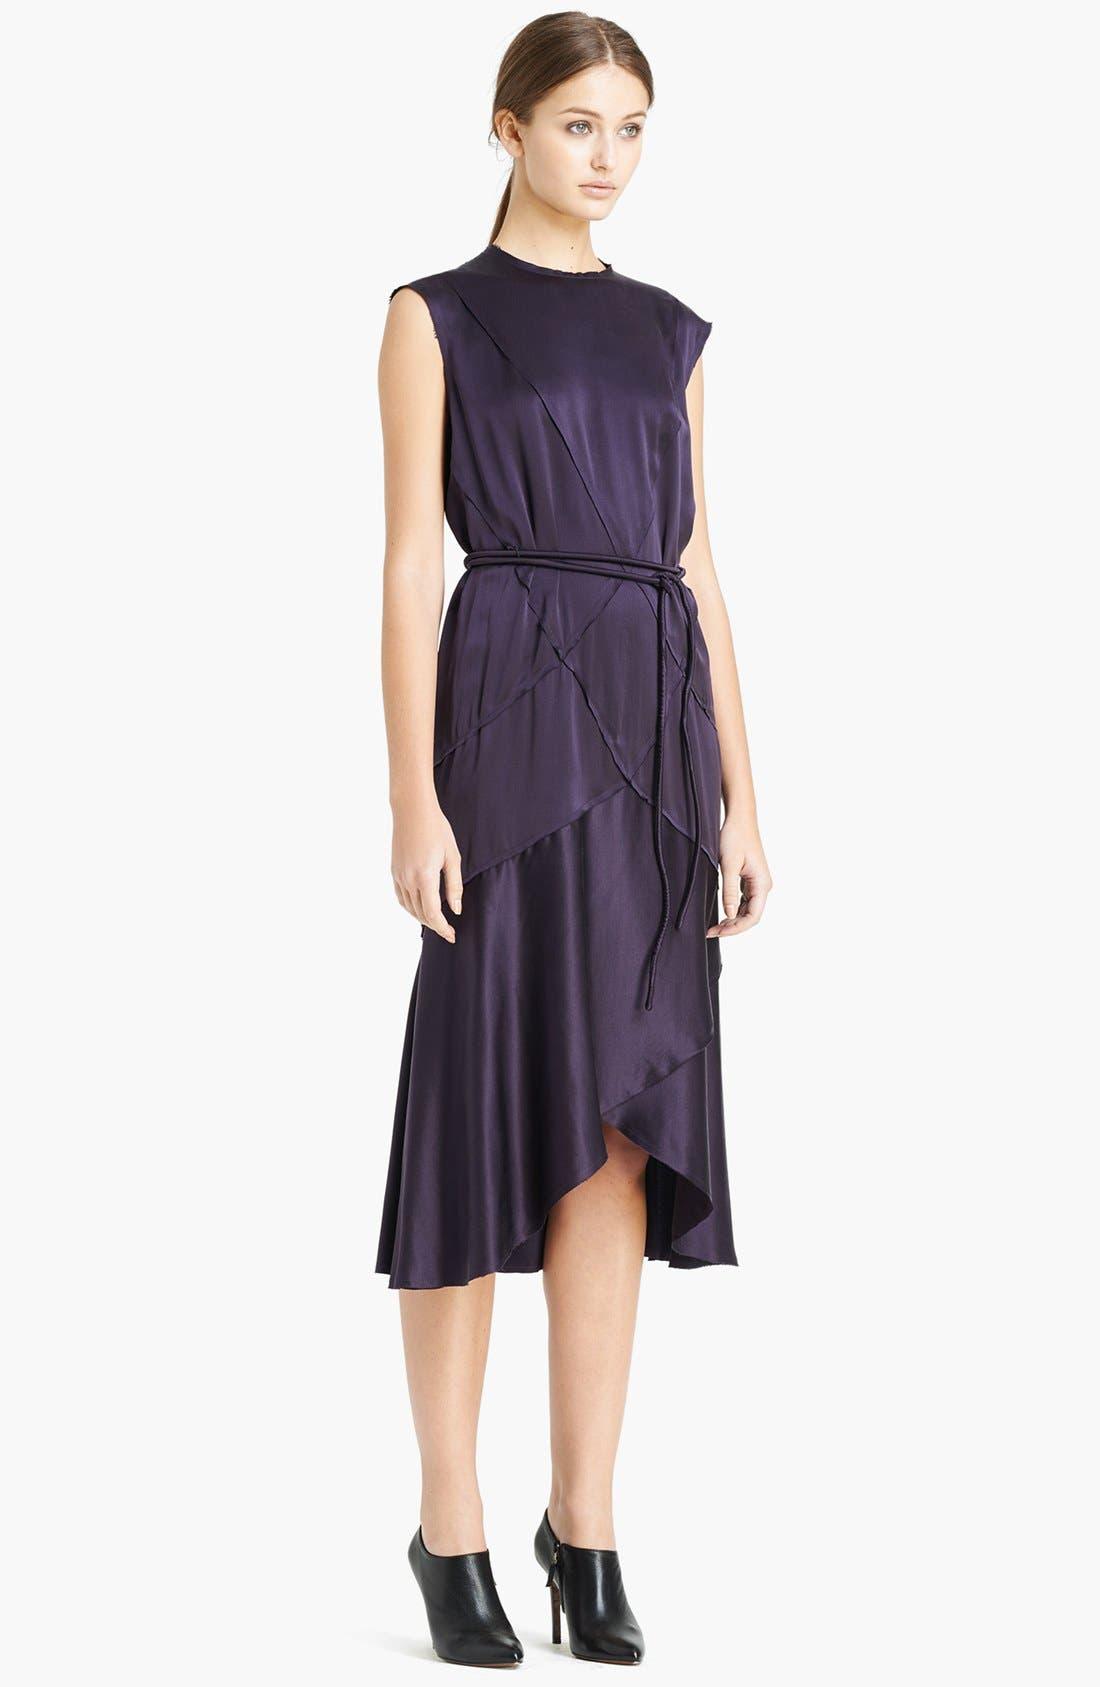 Alternate Image 1 Selected - Lanvin Sleeveless Satin Dress